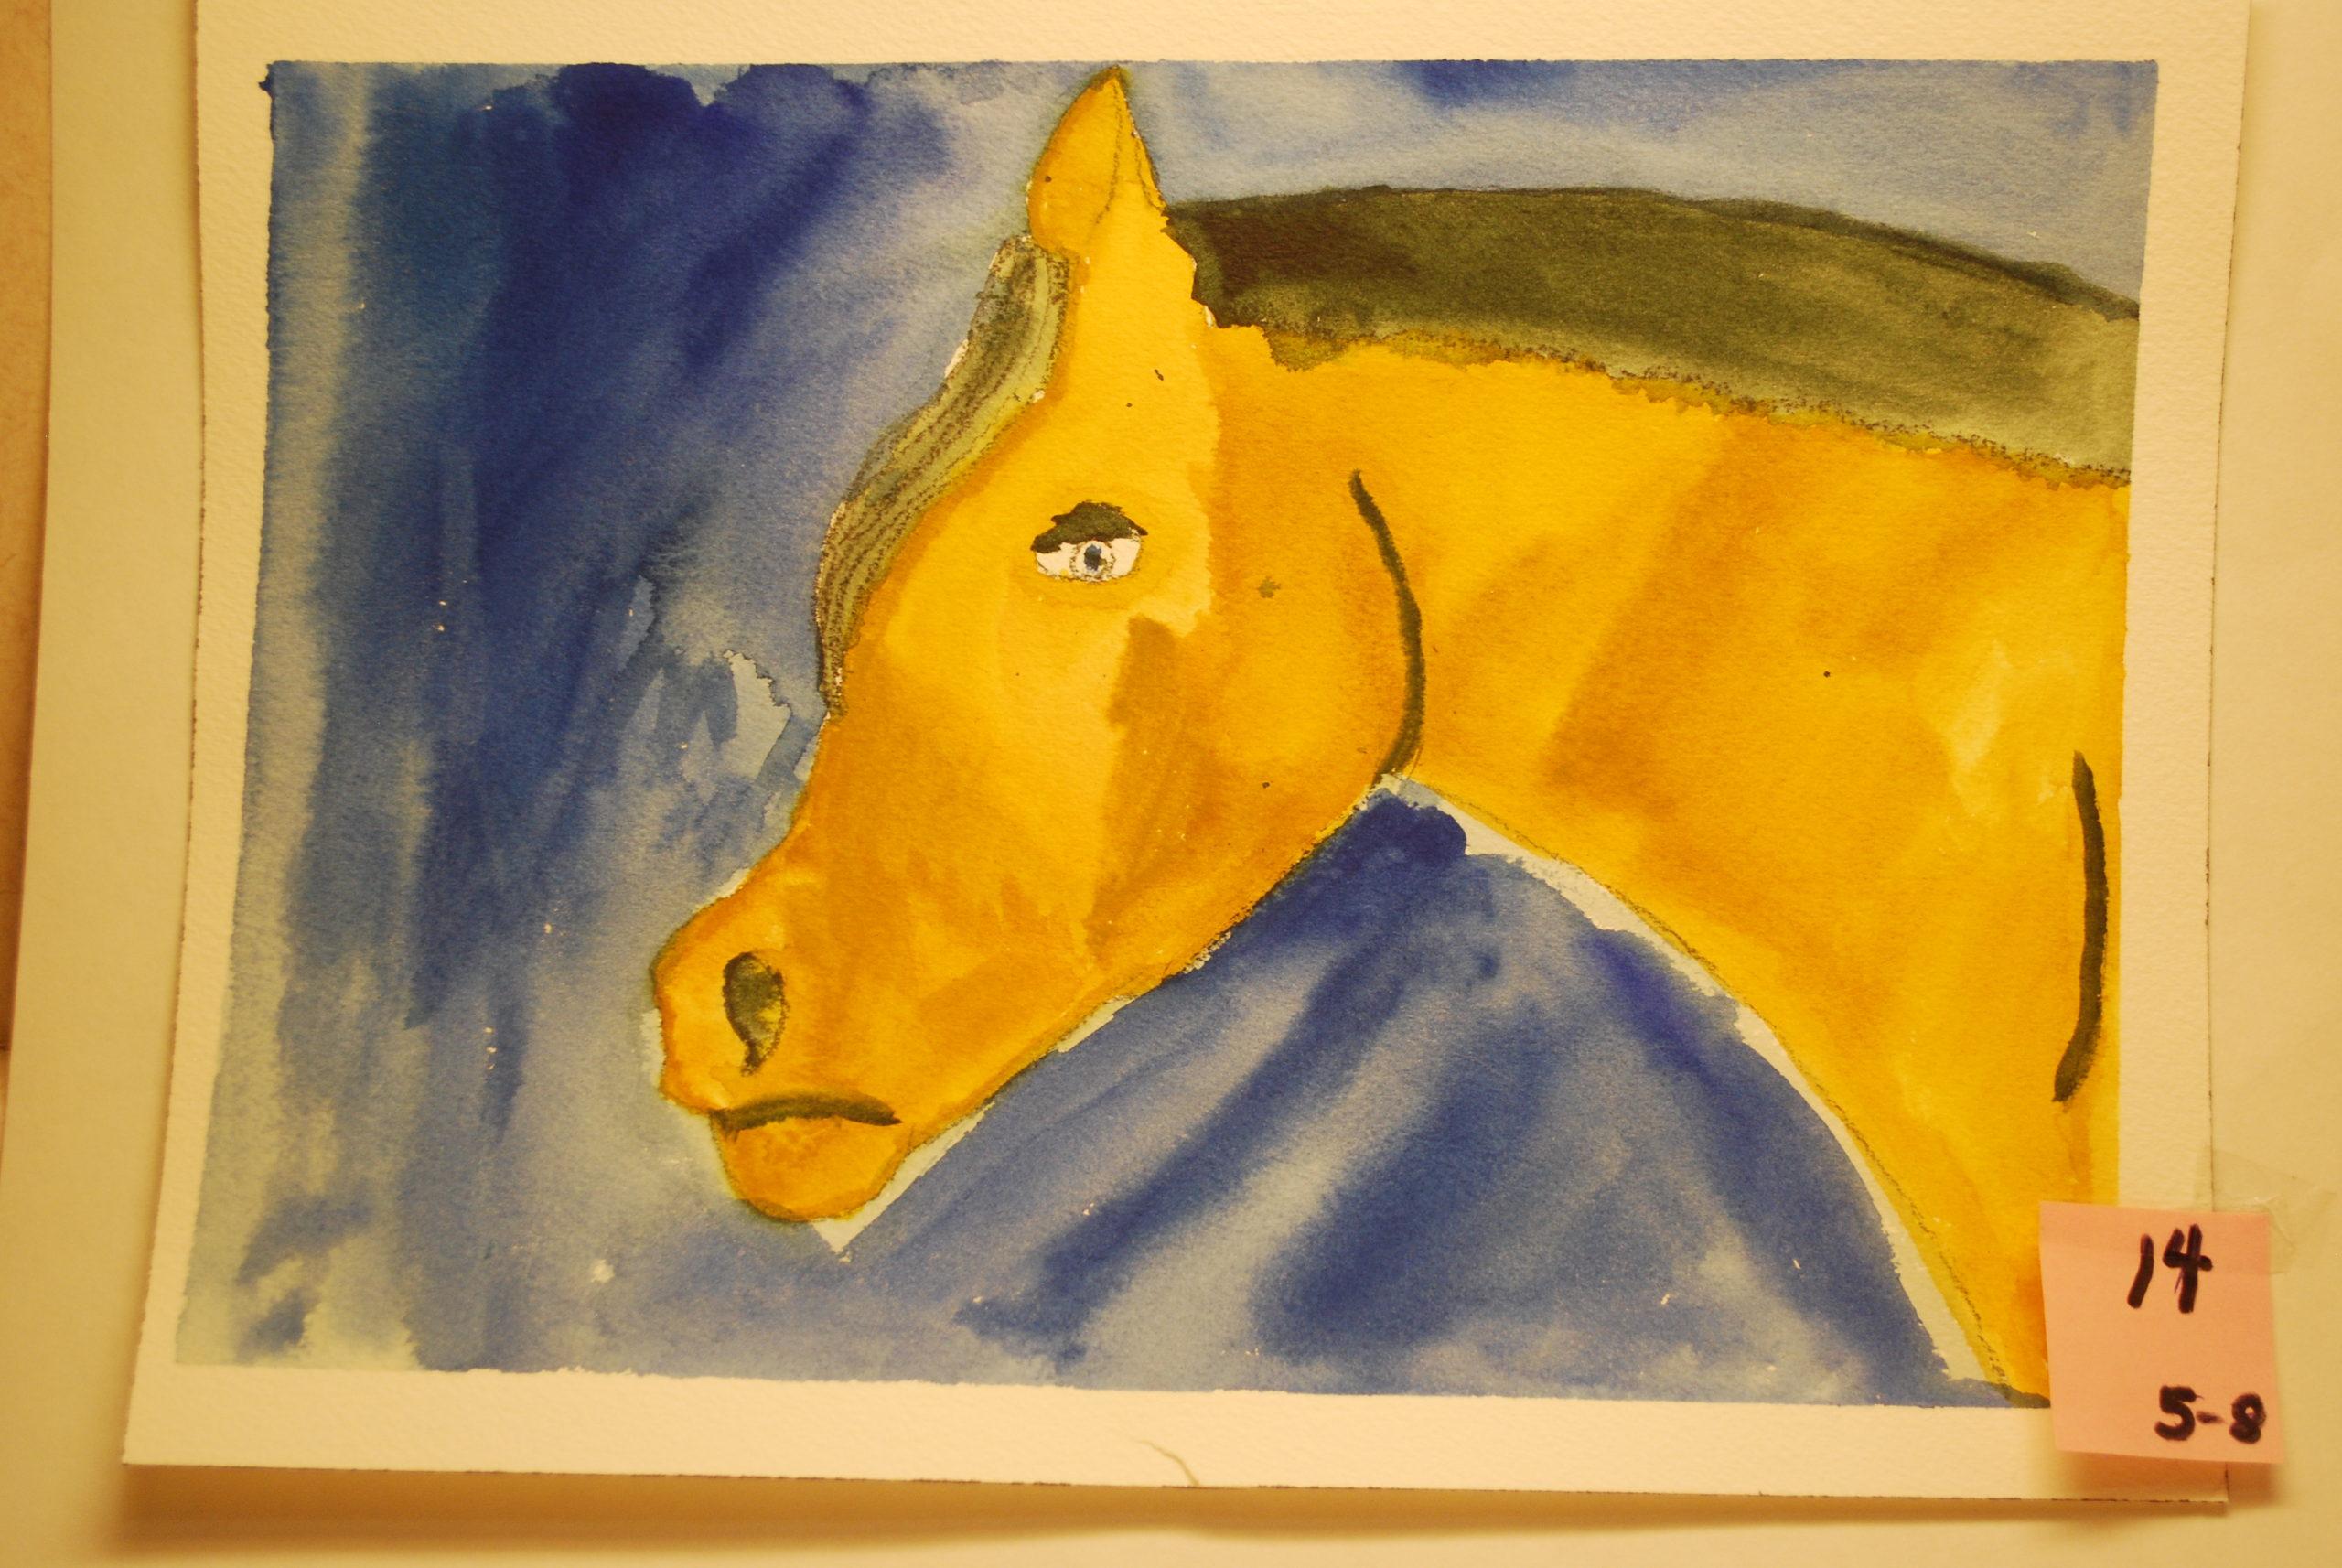 YAC 2020 #14 5-8 Yellow Horse b